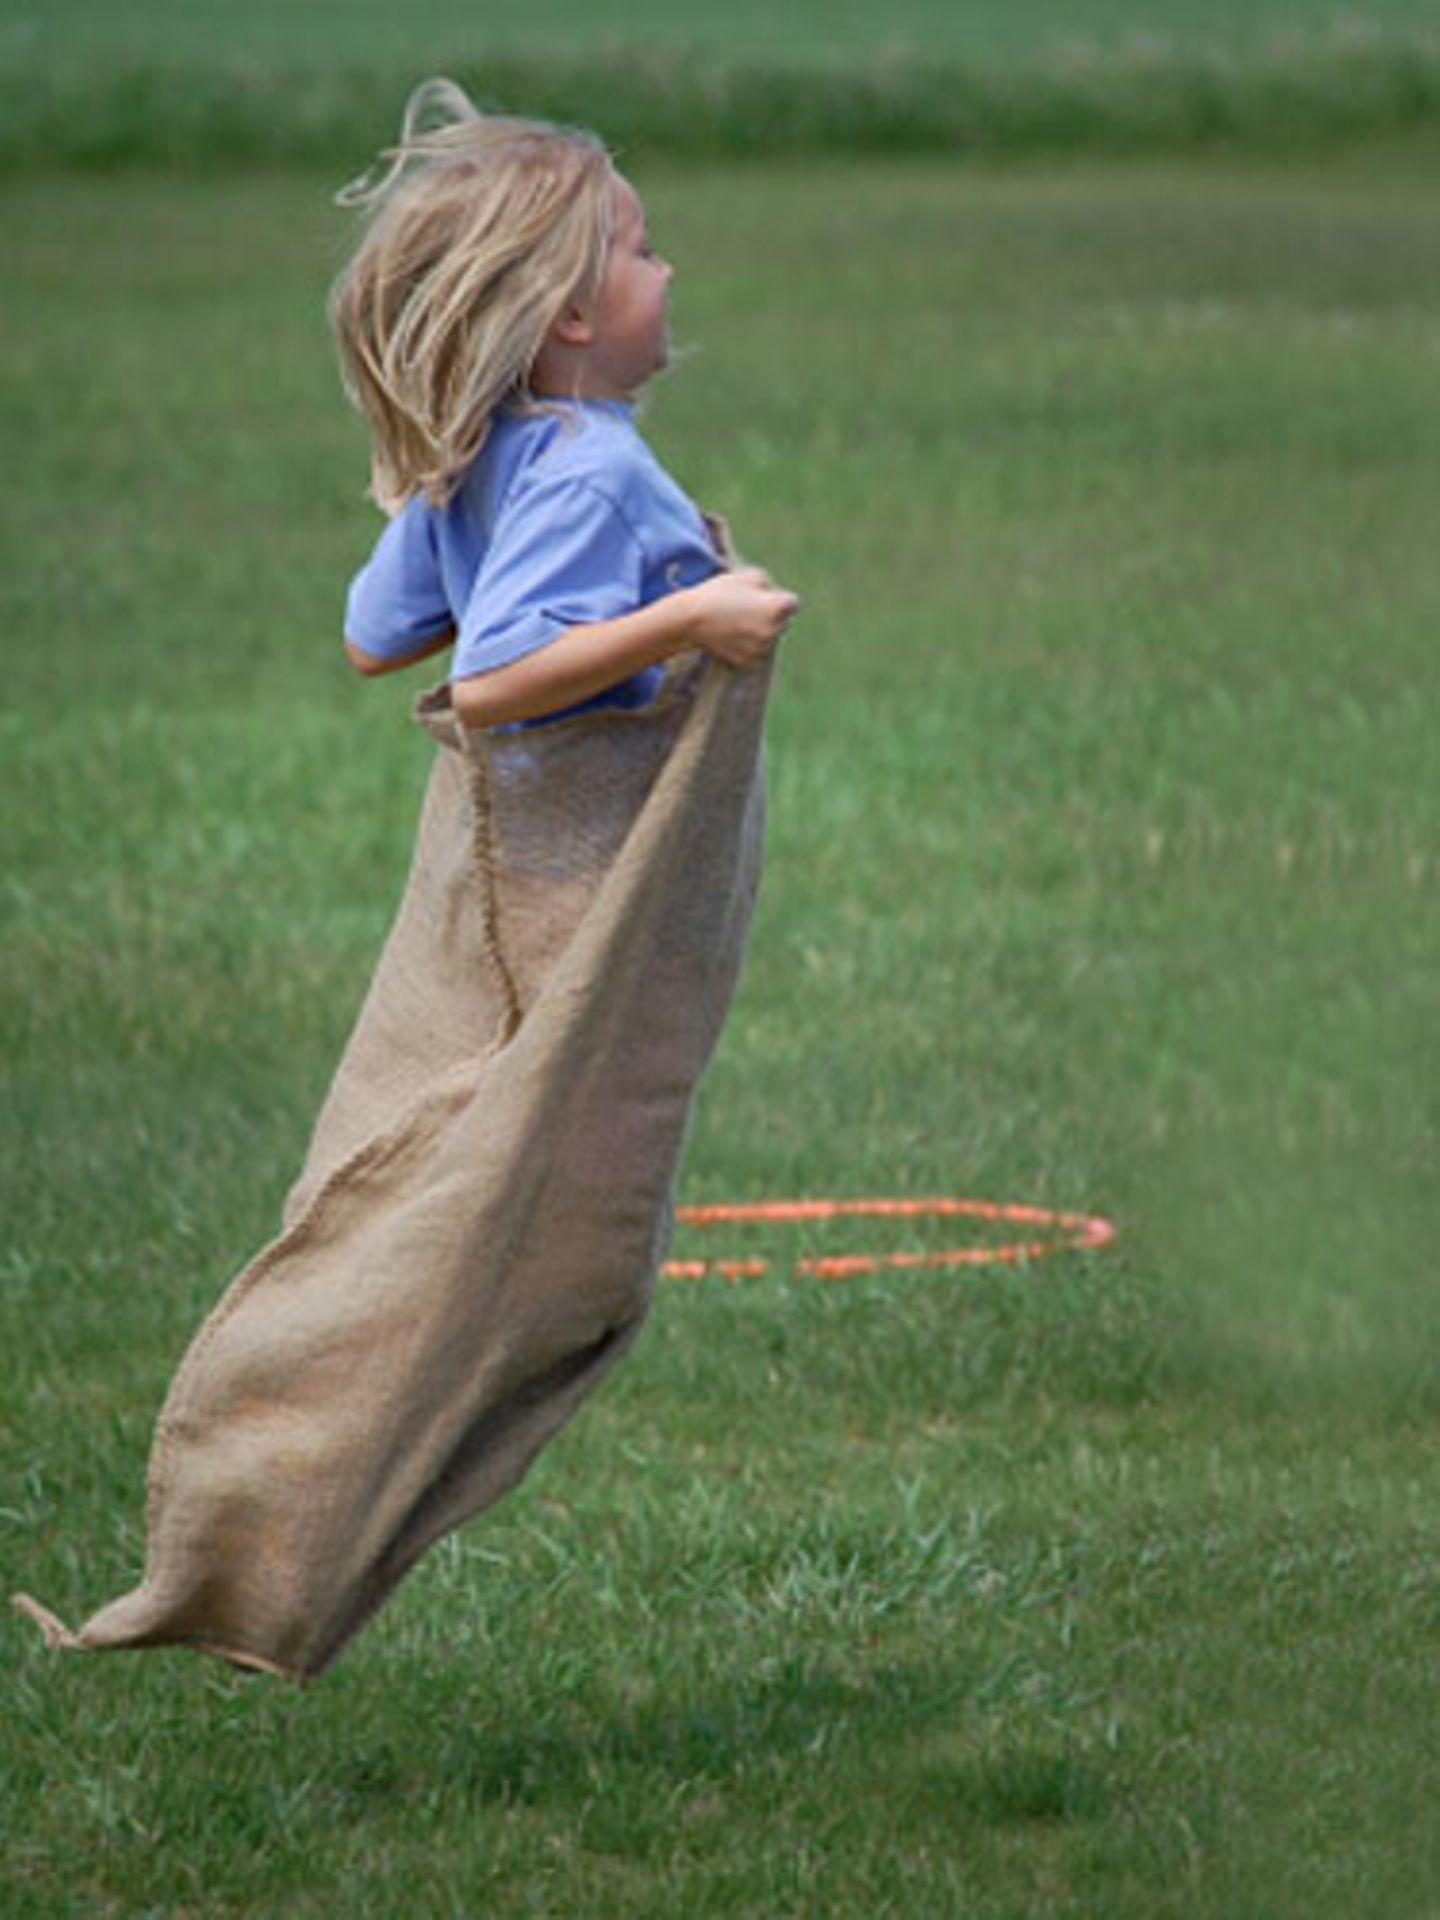 Alte Kinderspiele: Sackhüpfen